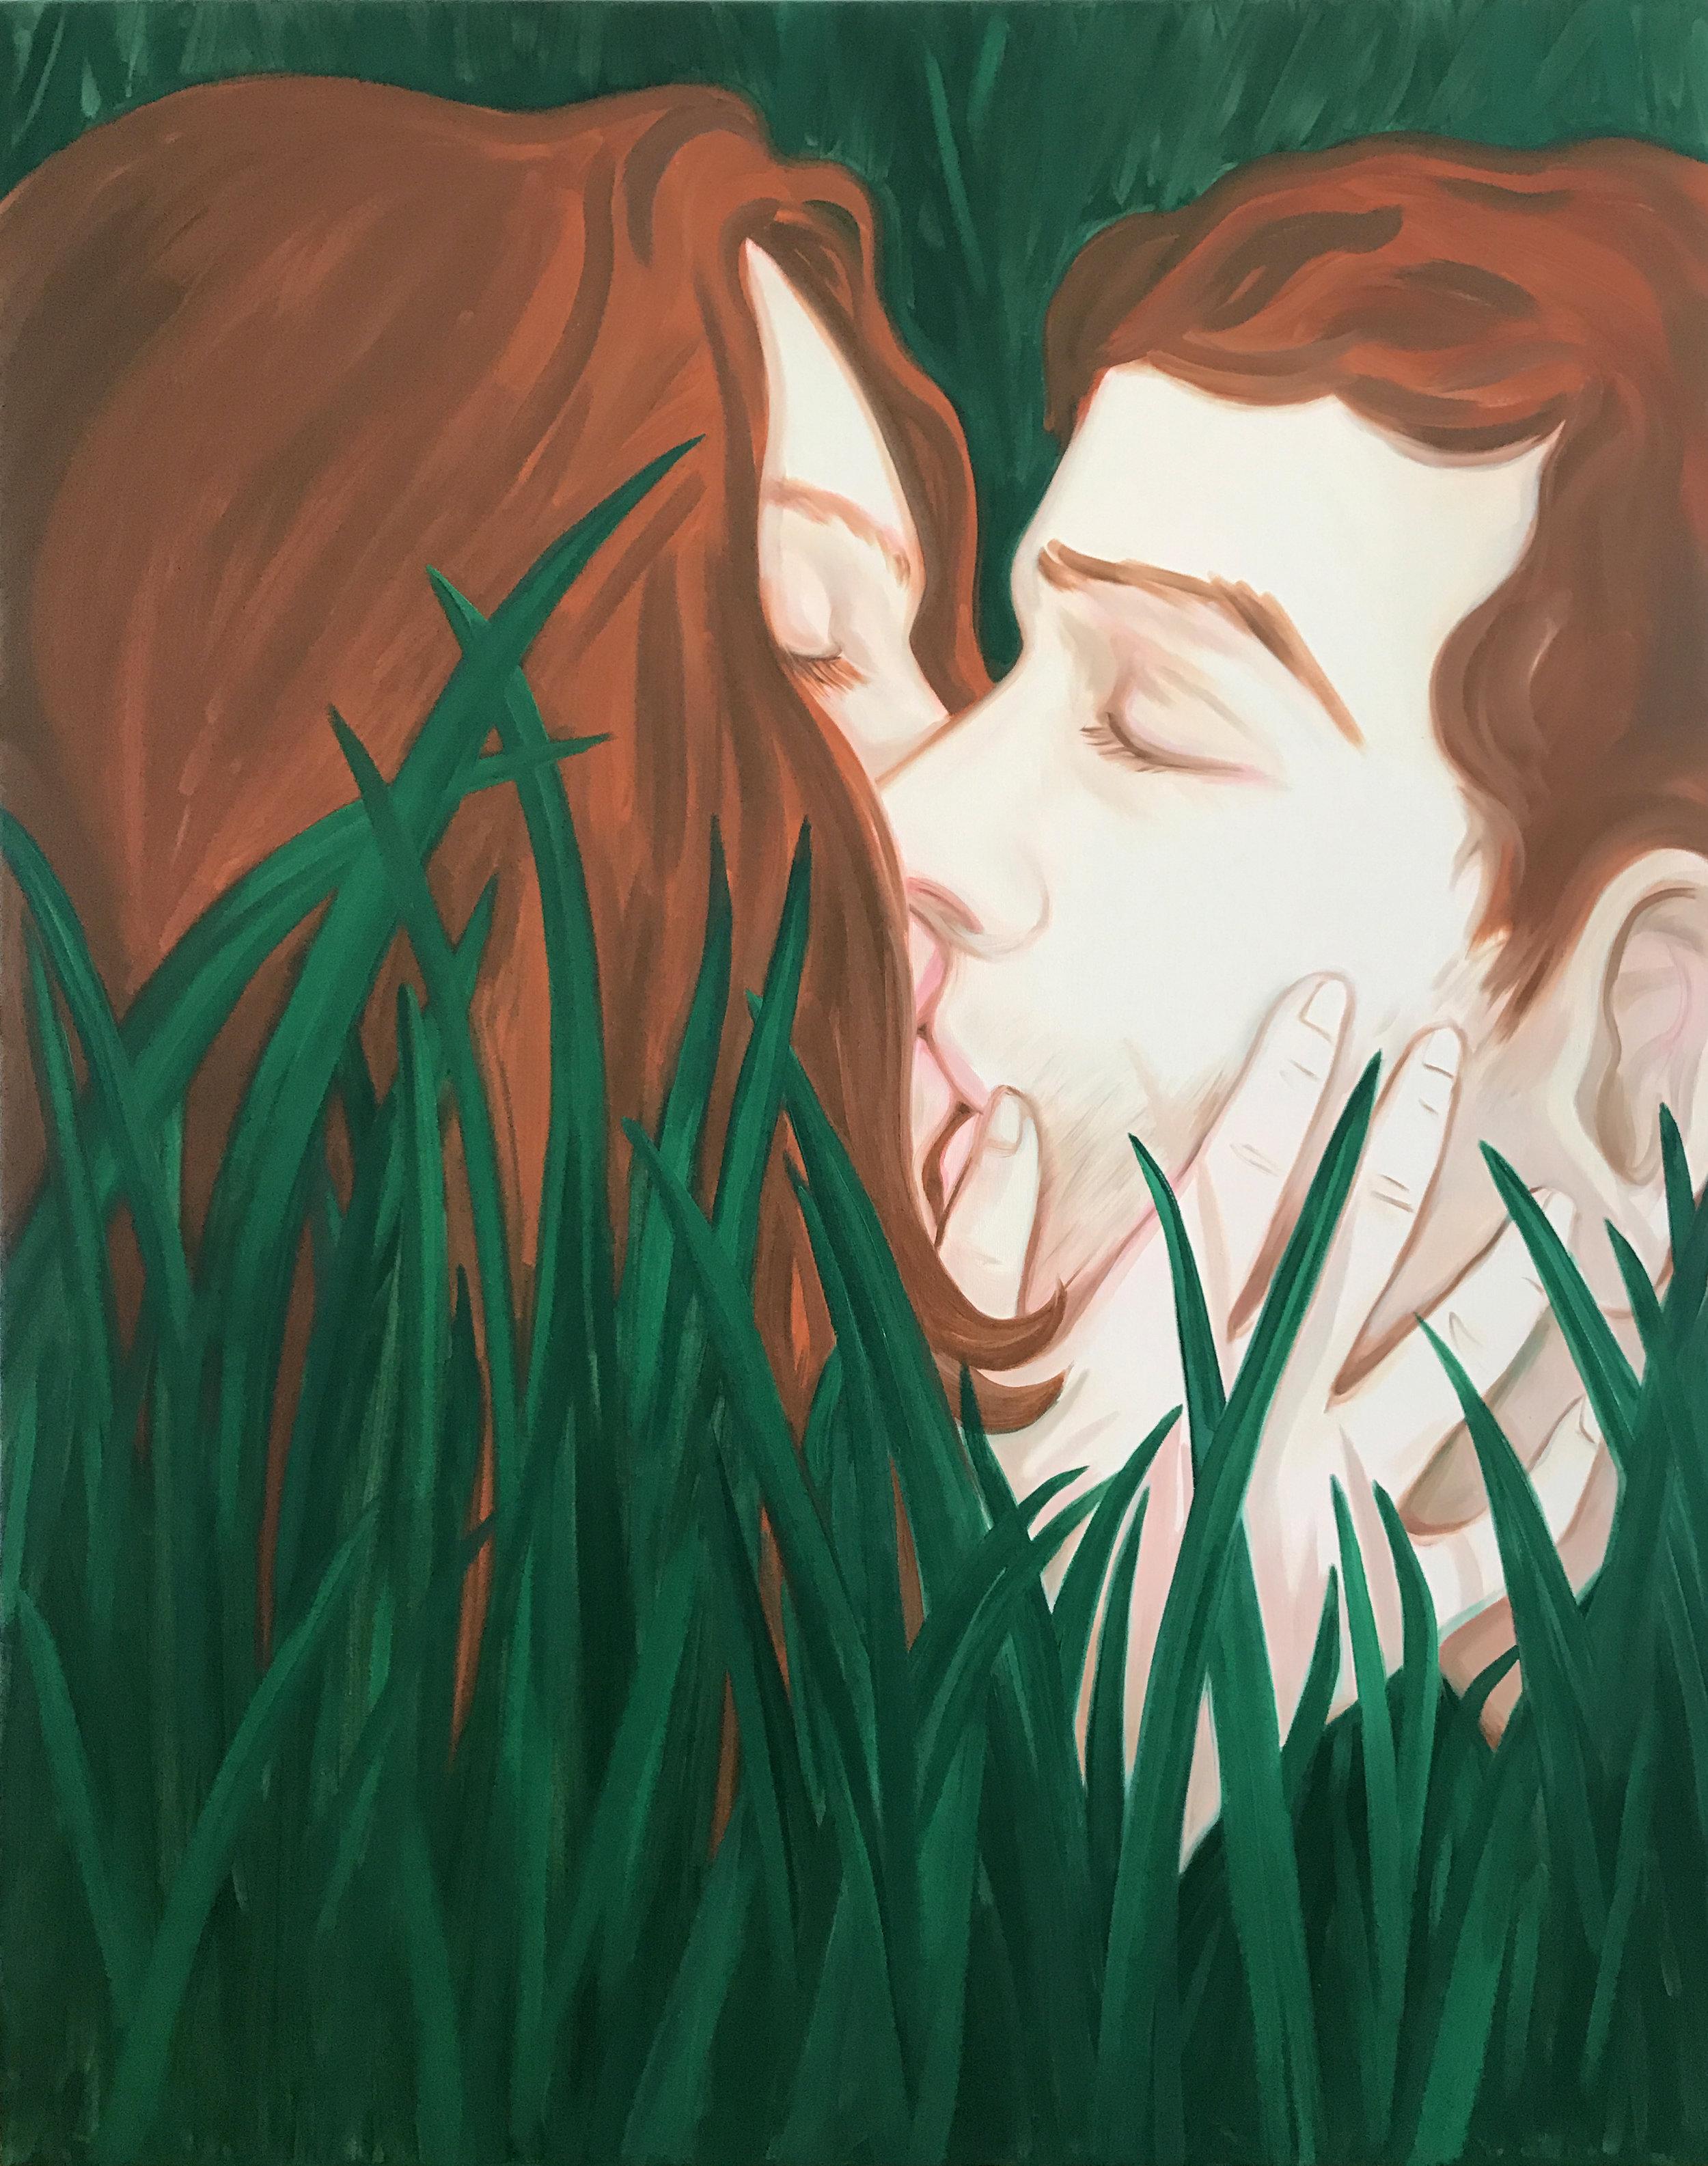 Les grands amants II Oil on canvas 145 x 115 cm 2017